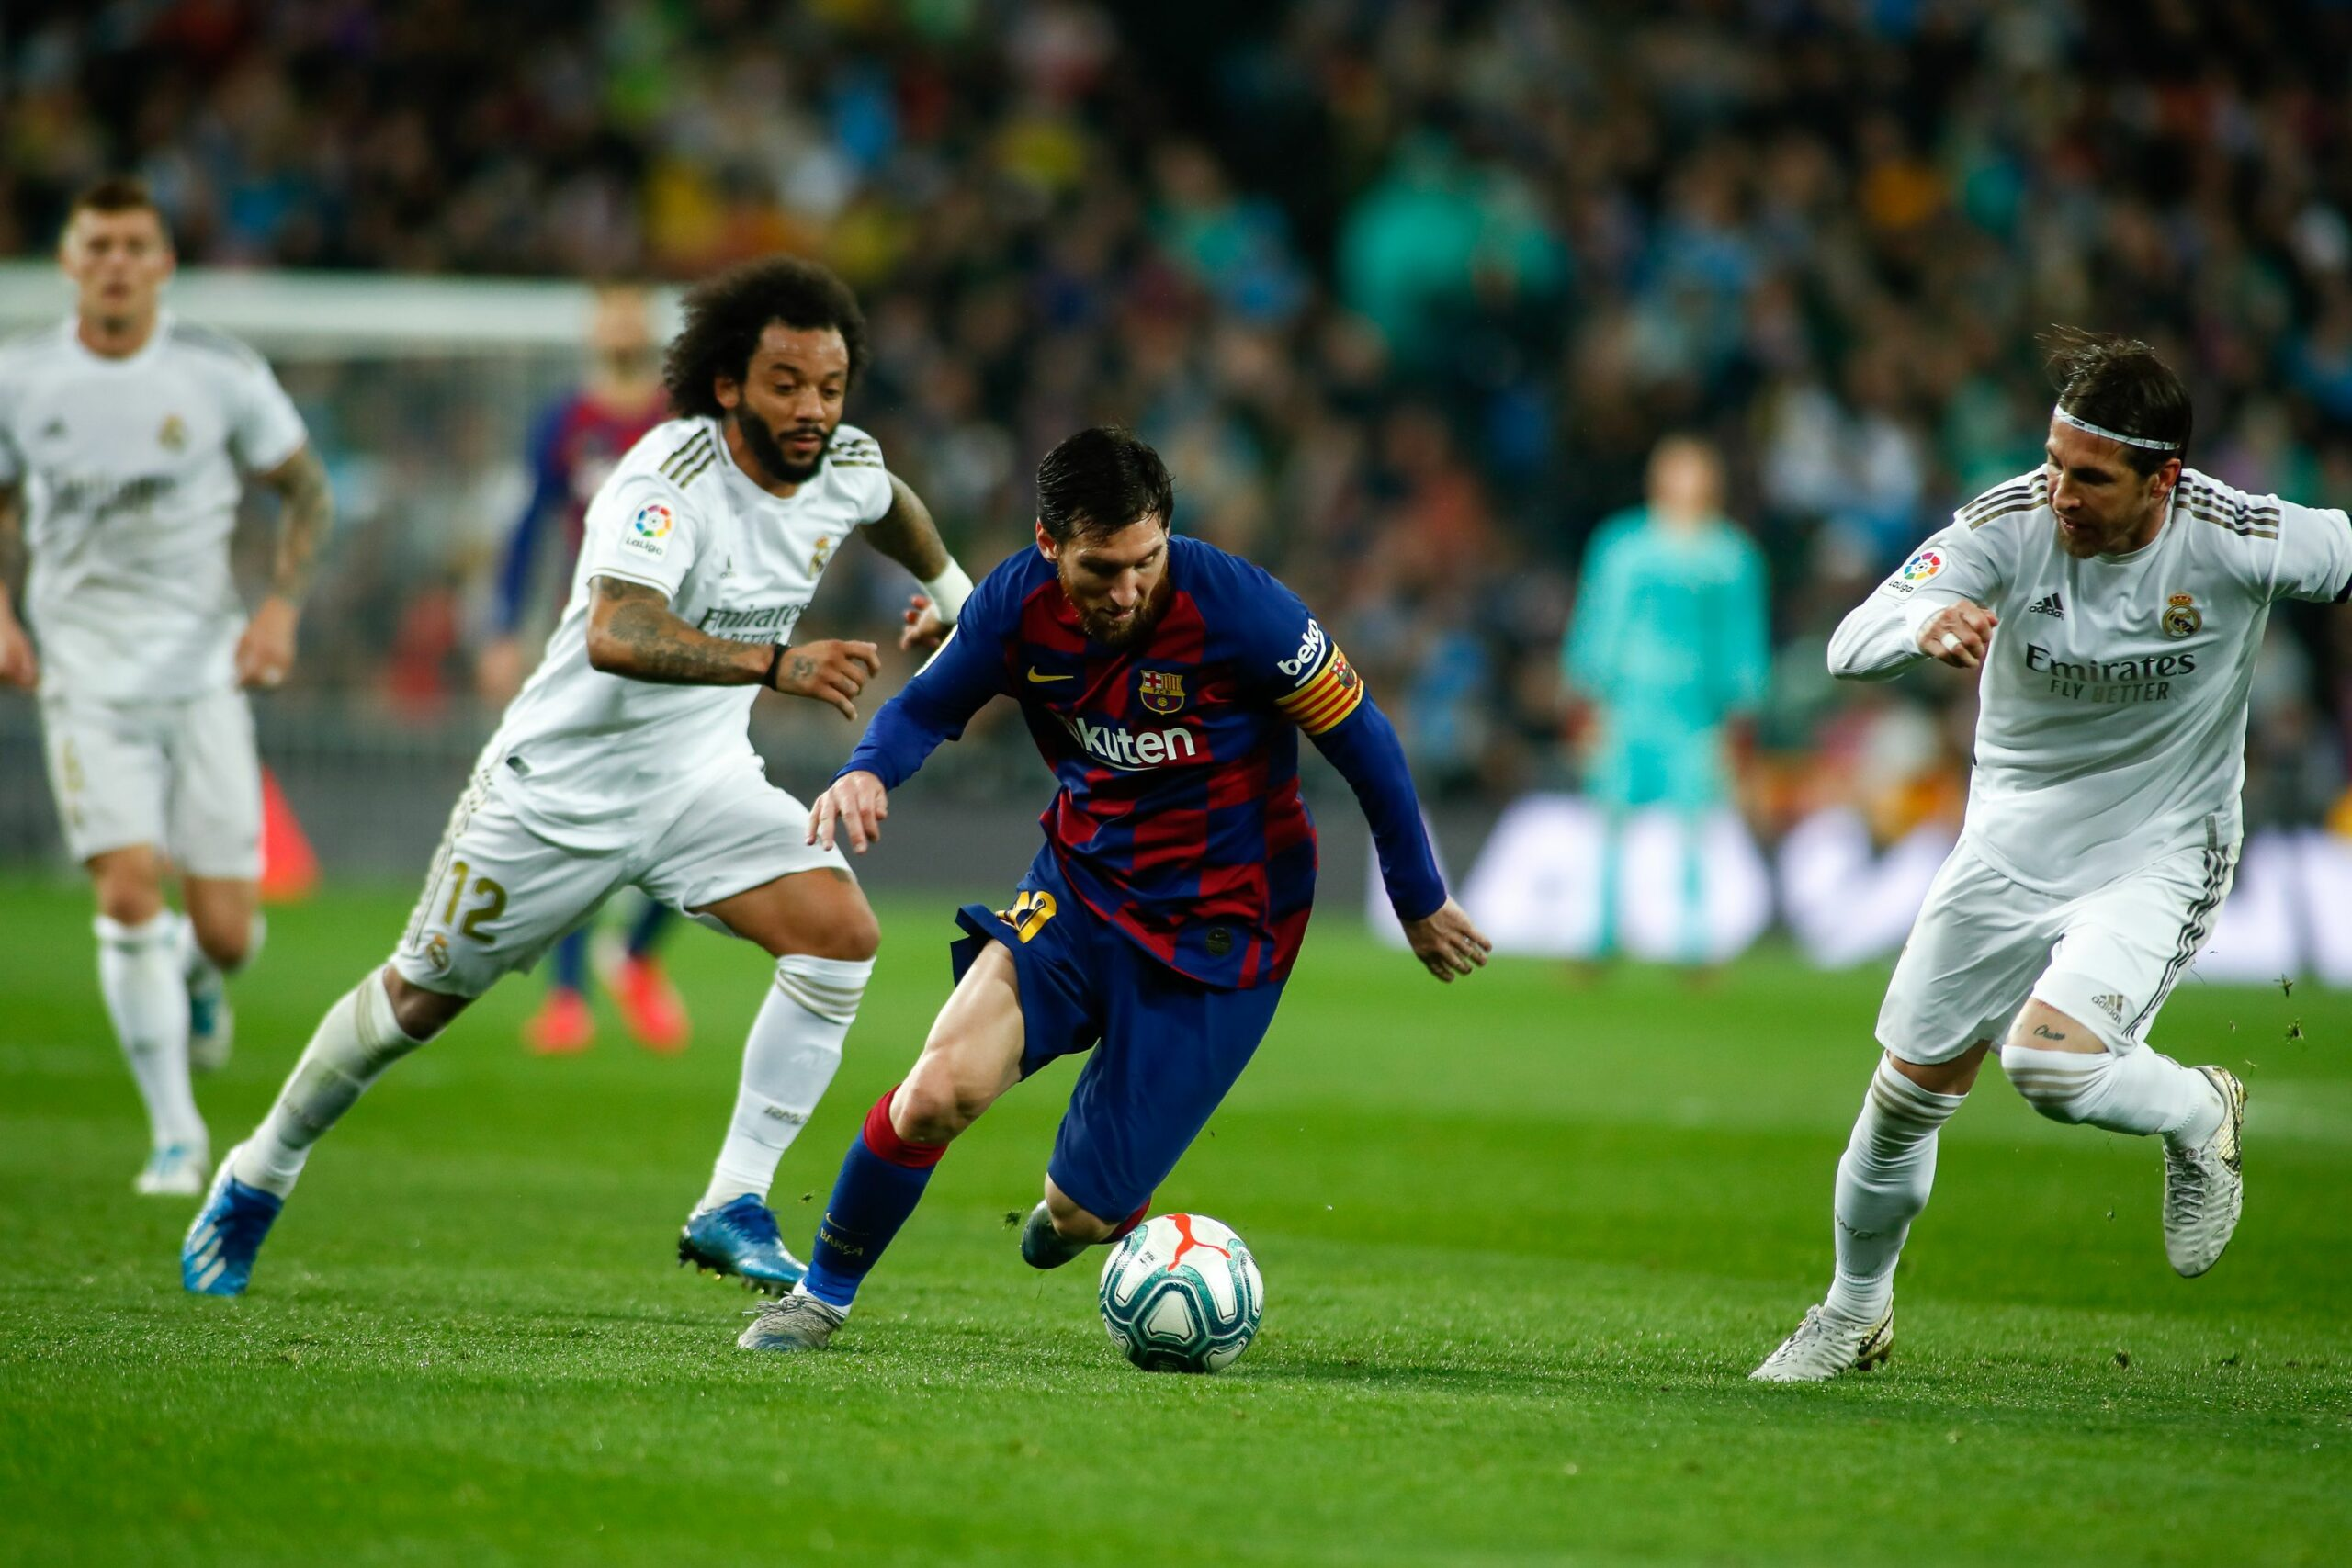 Messi, Ramos i Marcelo, durant un clàssic | Europa Press